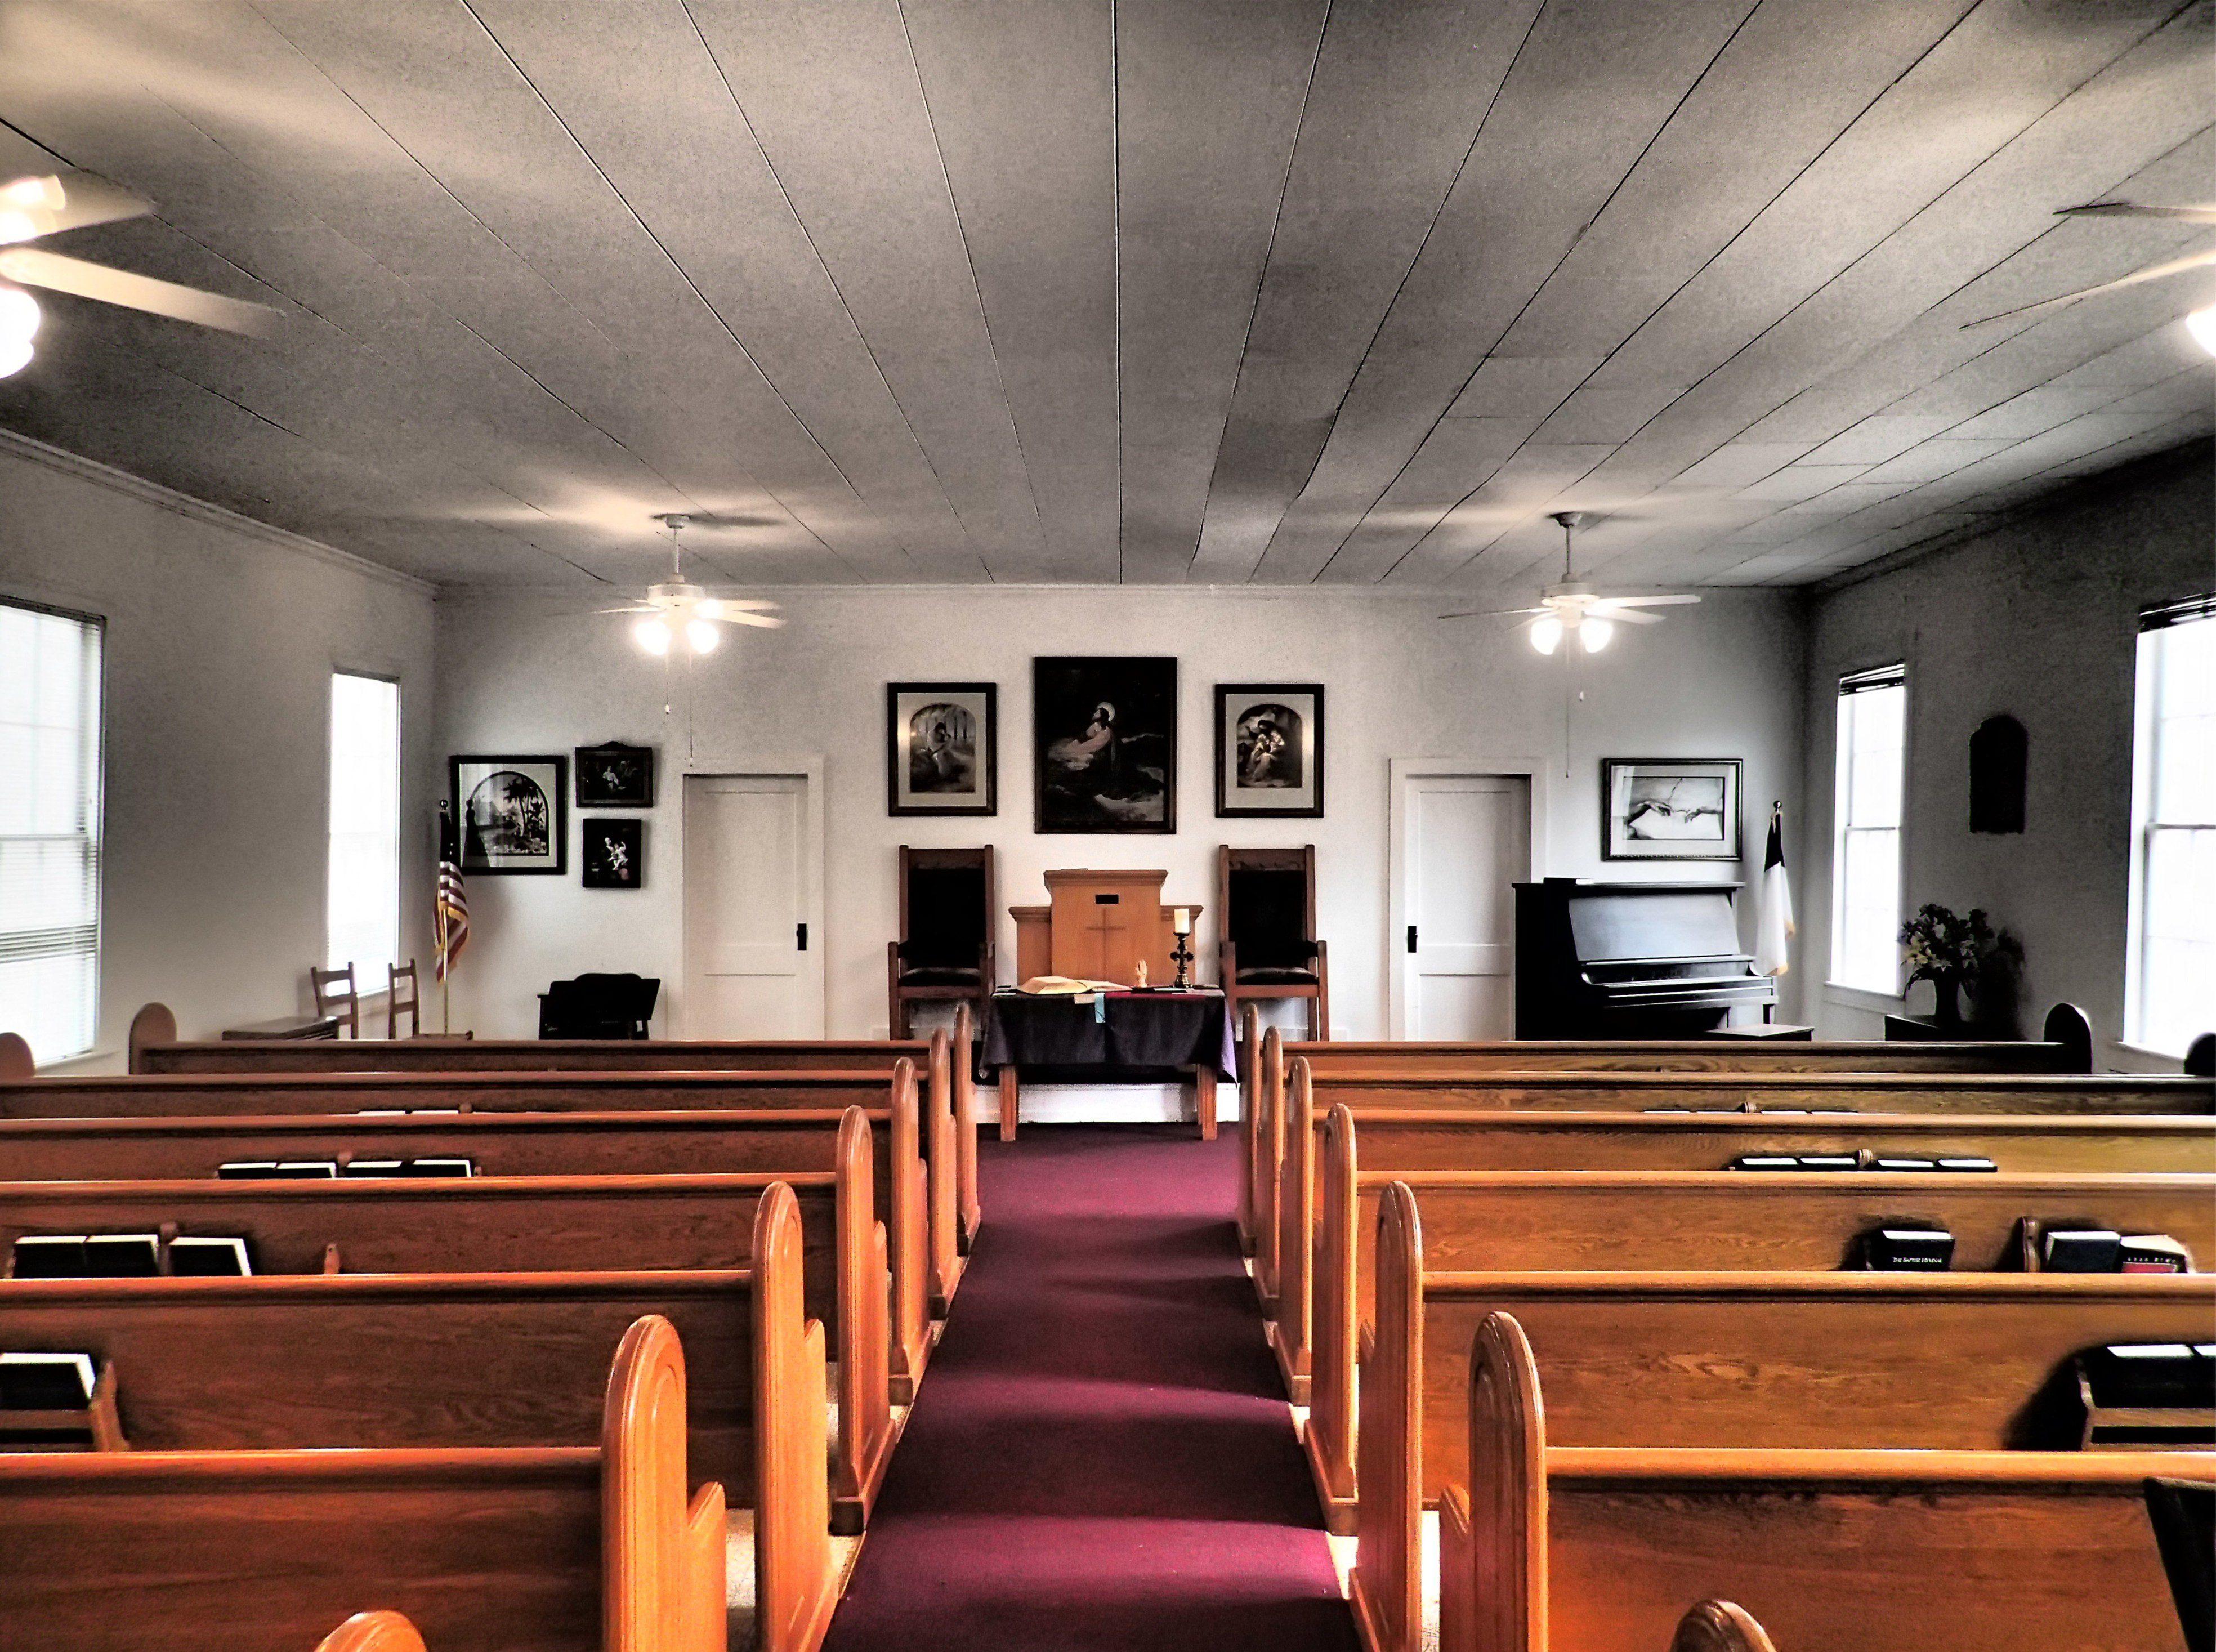 My Thanksgiving Church By Pam Durso